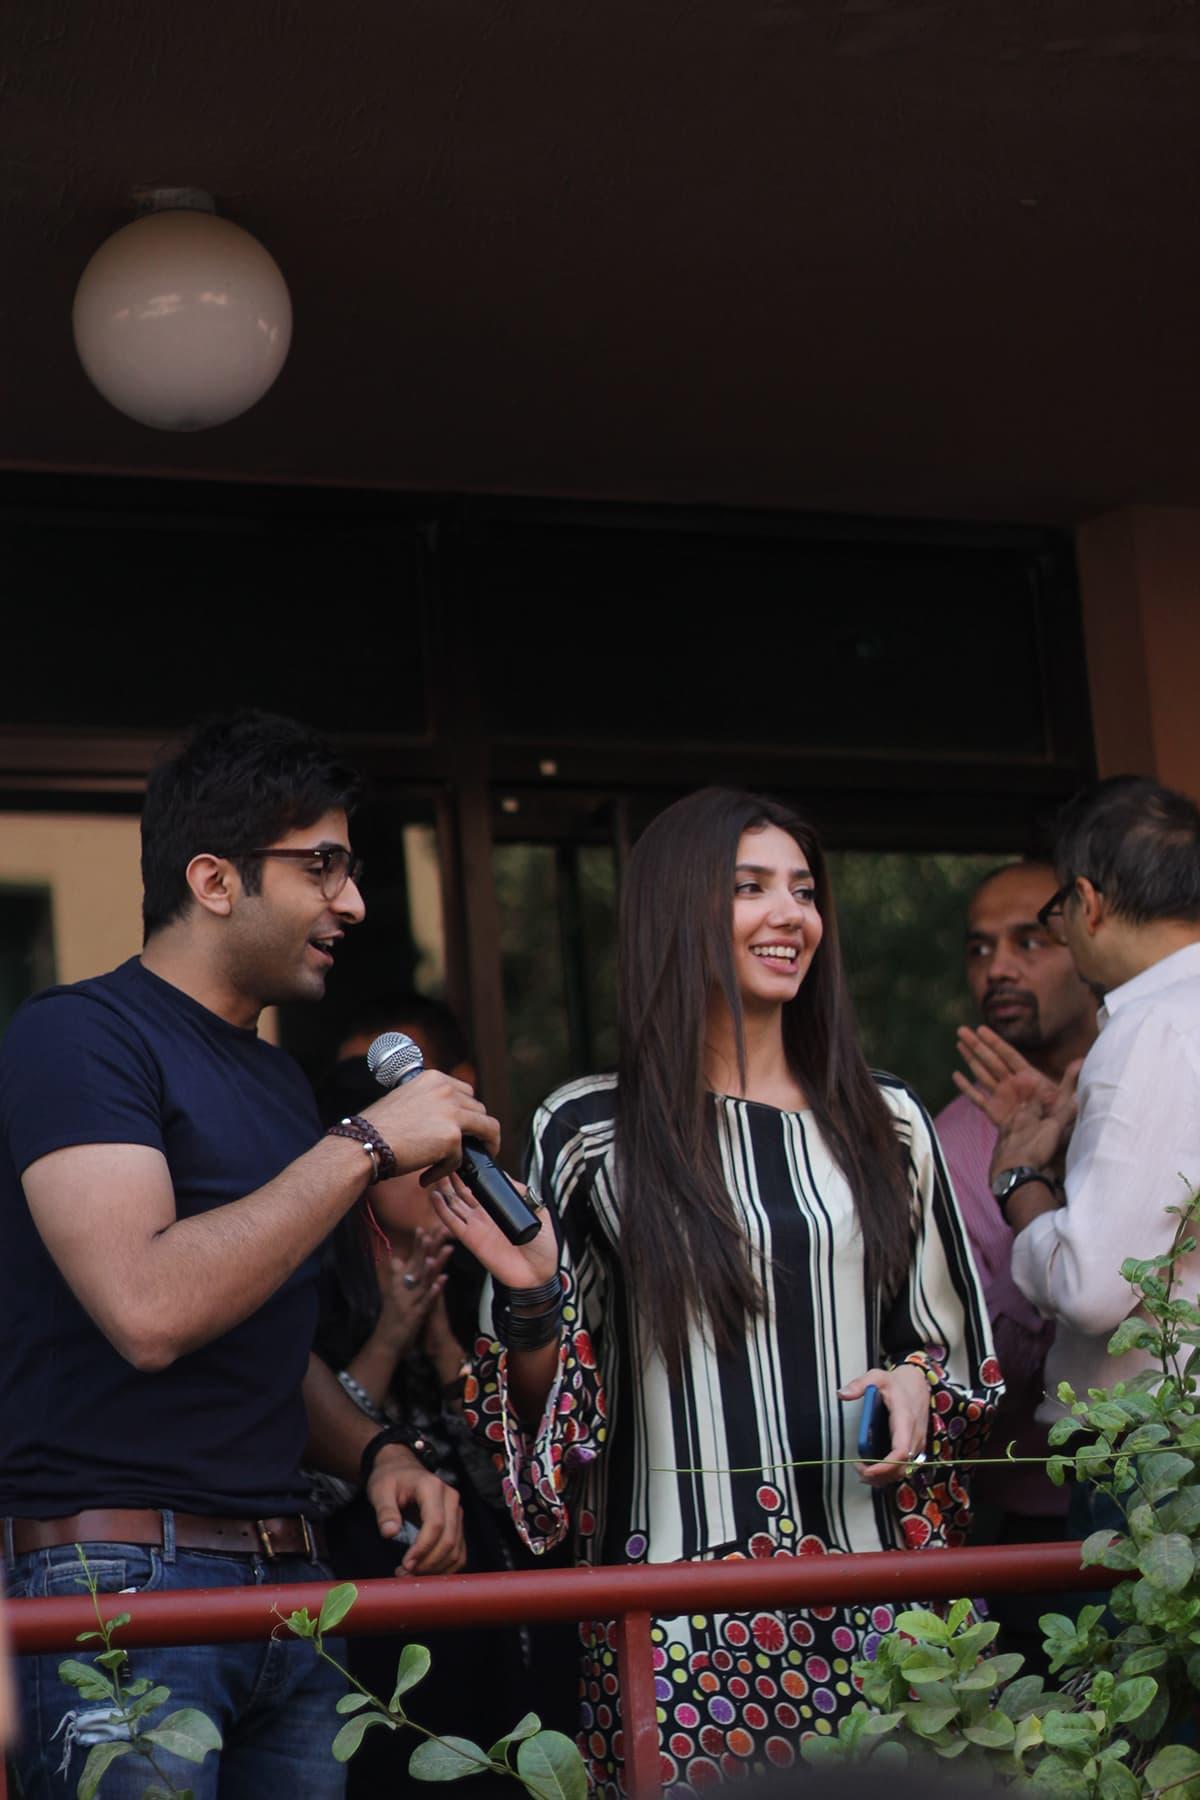 Mahira Khan and Sheheryar Munawar speaking to the students. — Photo by Saad Arfin